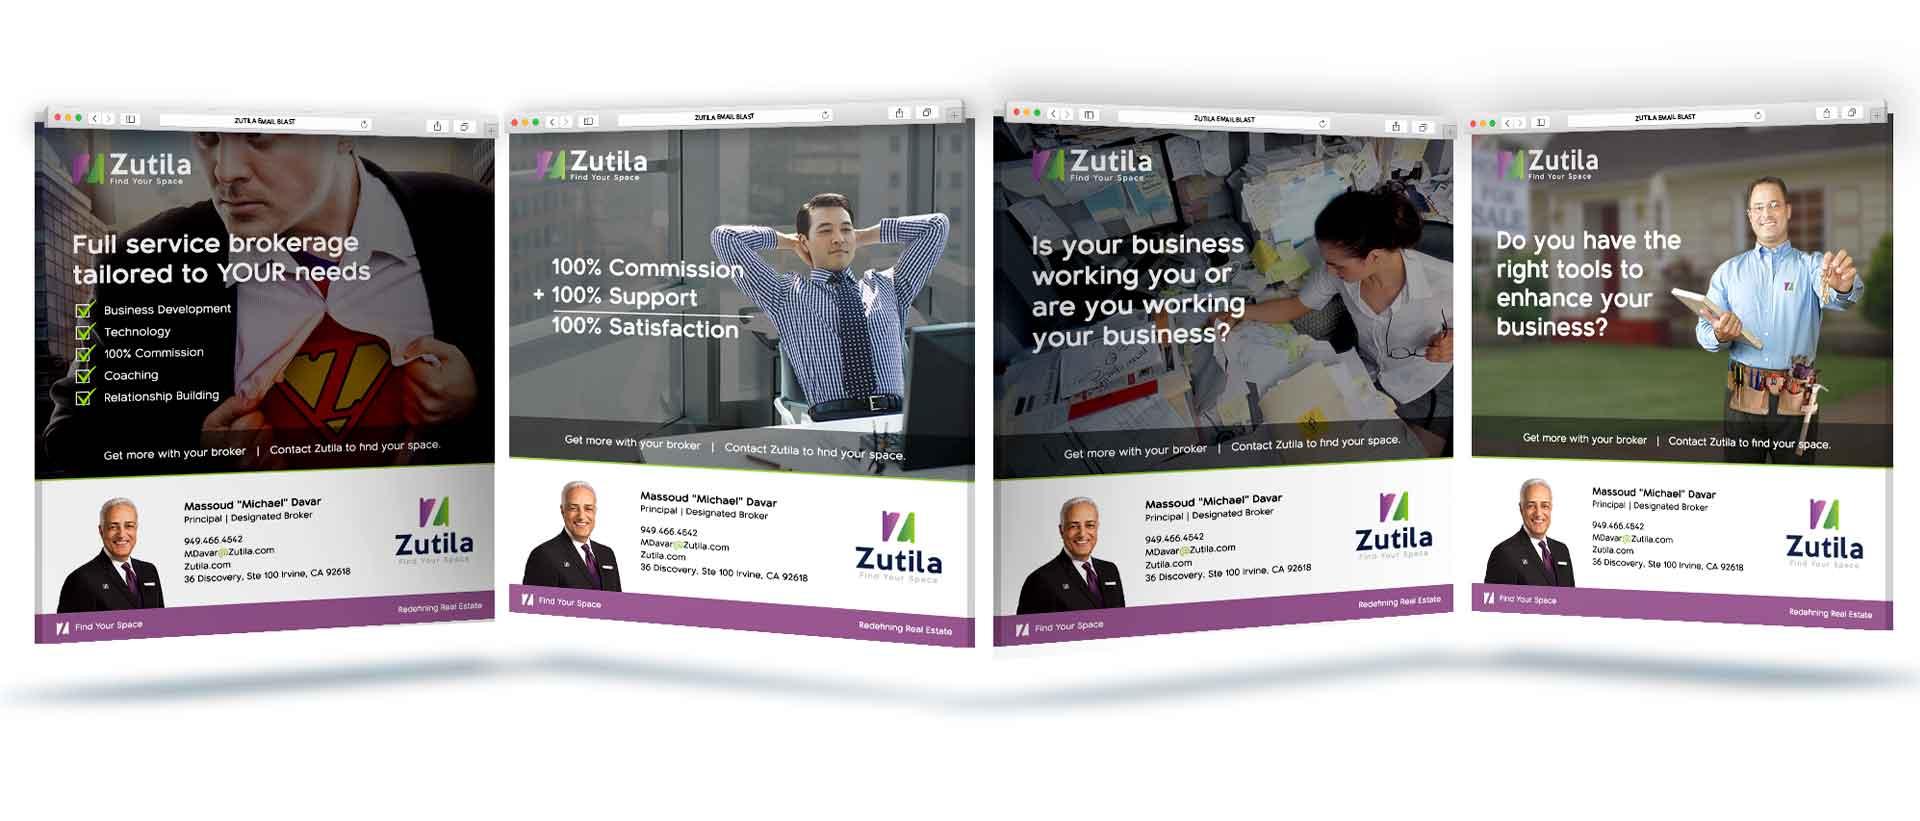 Zutila Email Blast Campaigns